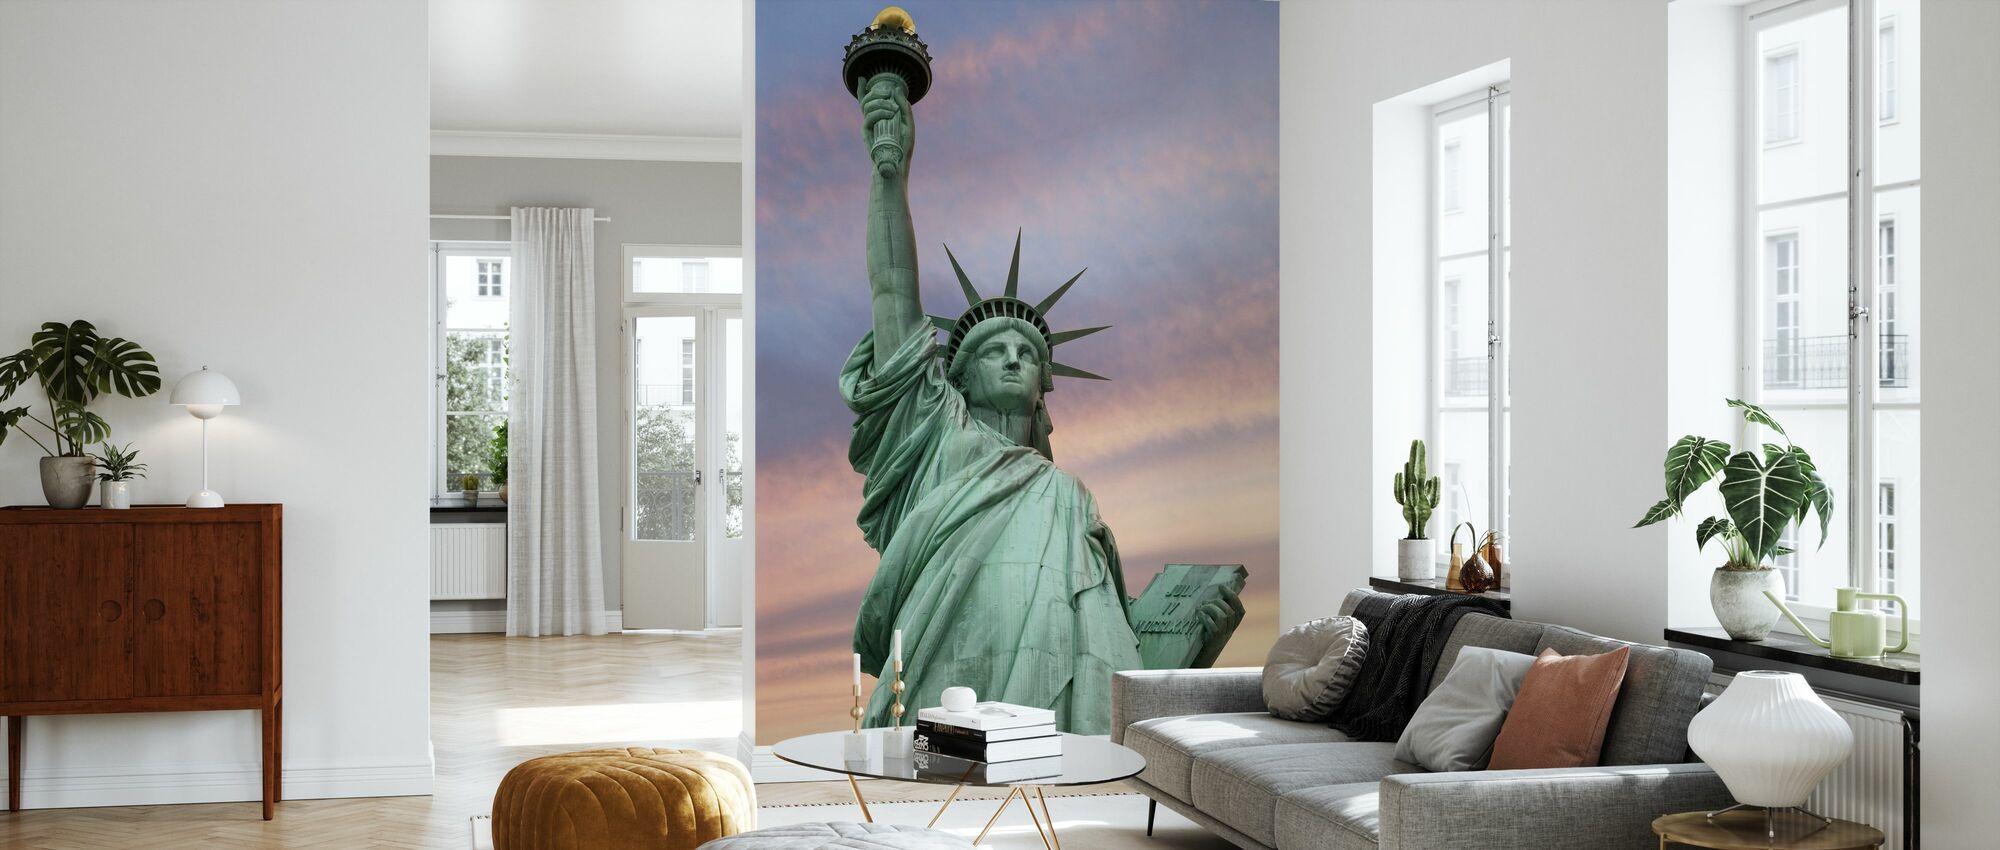 Estatua de la Libertad bajo un cielo vivo - Papel pintado - Salón